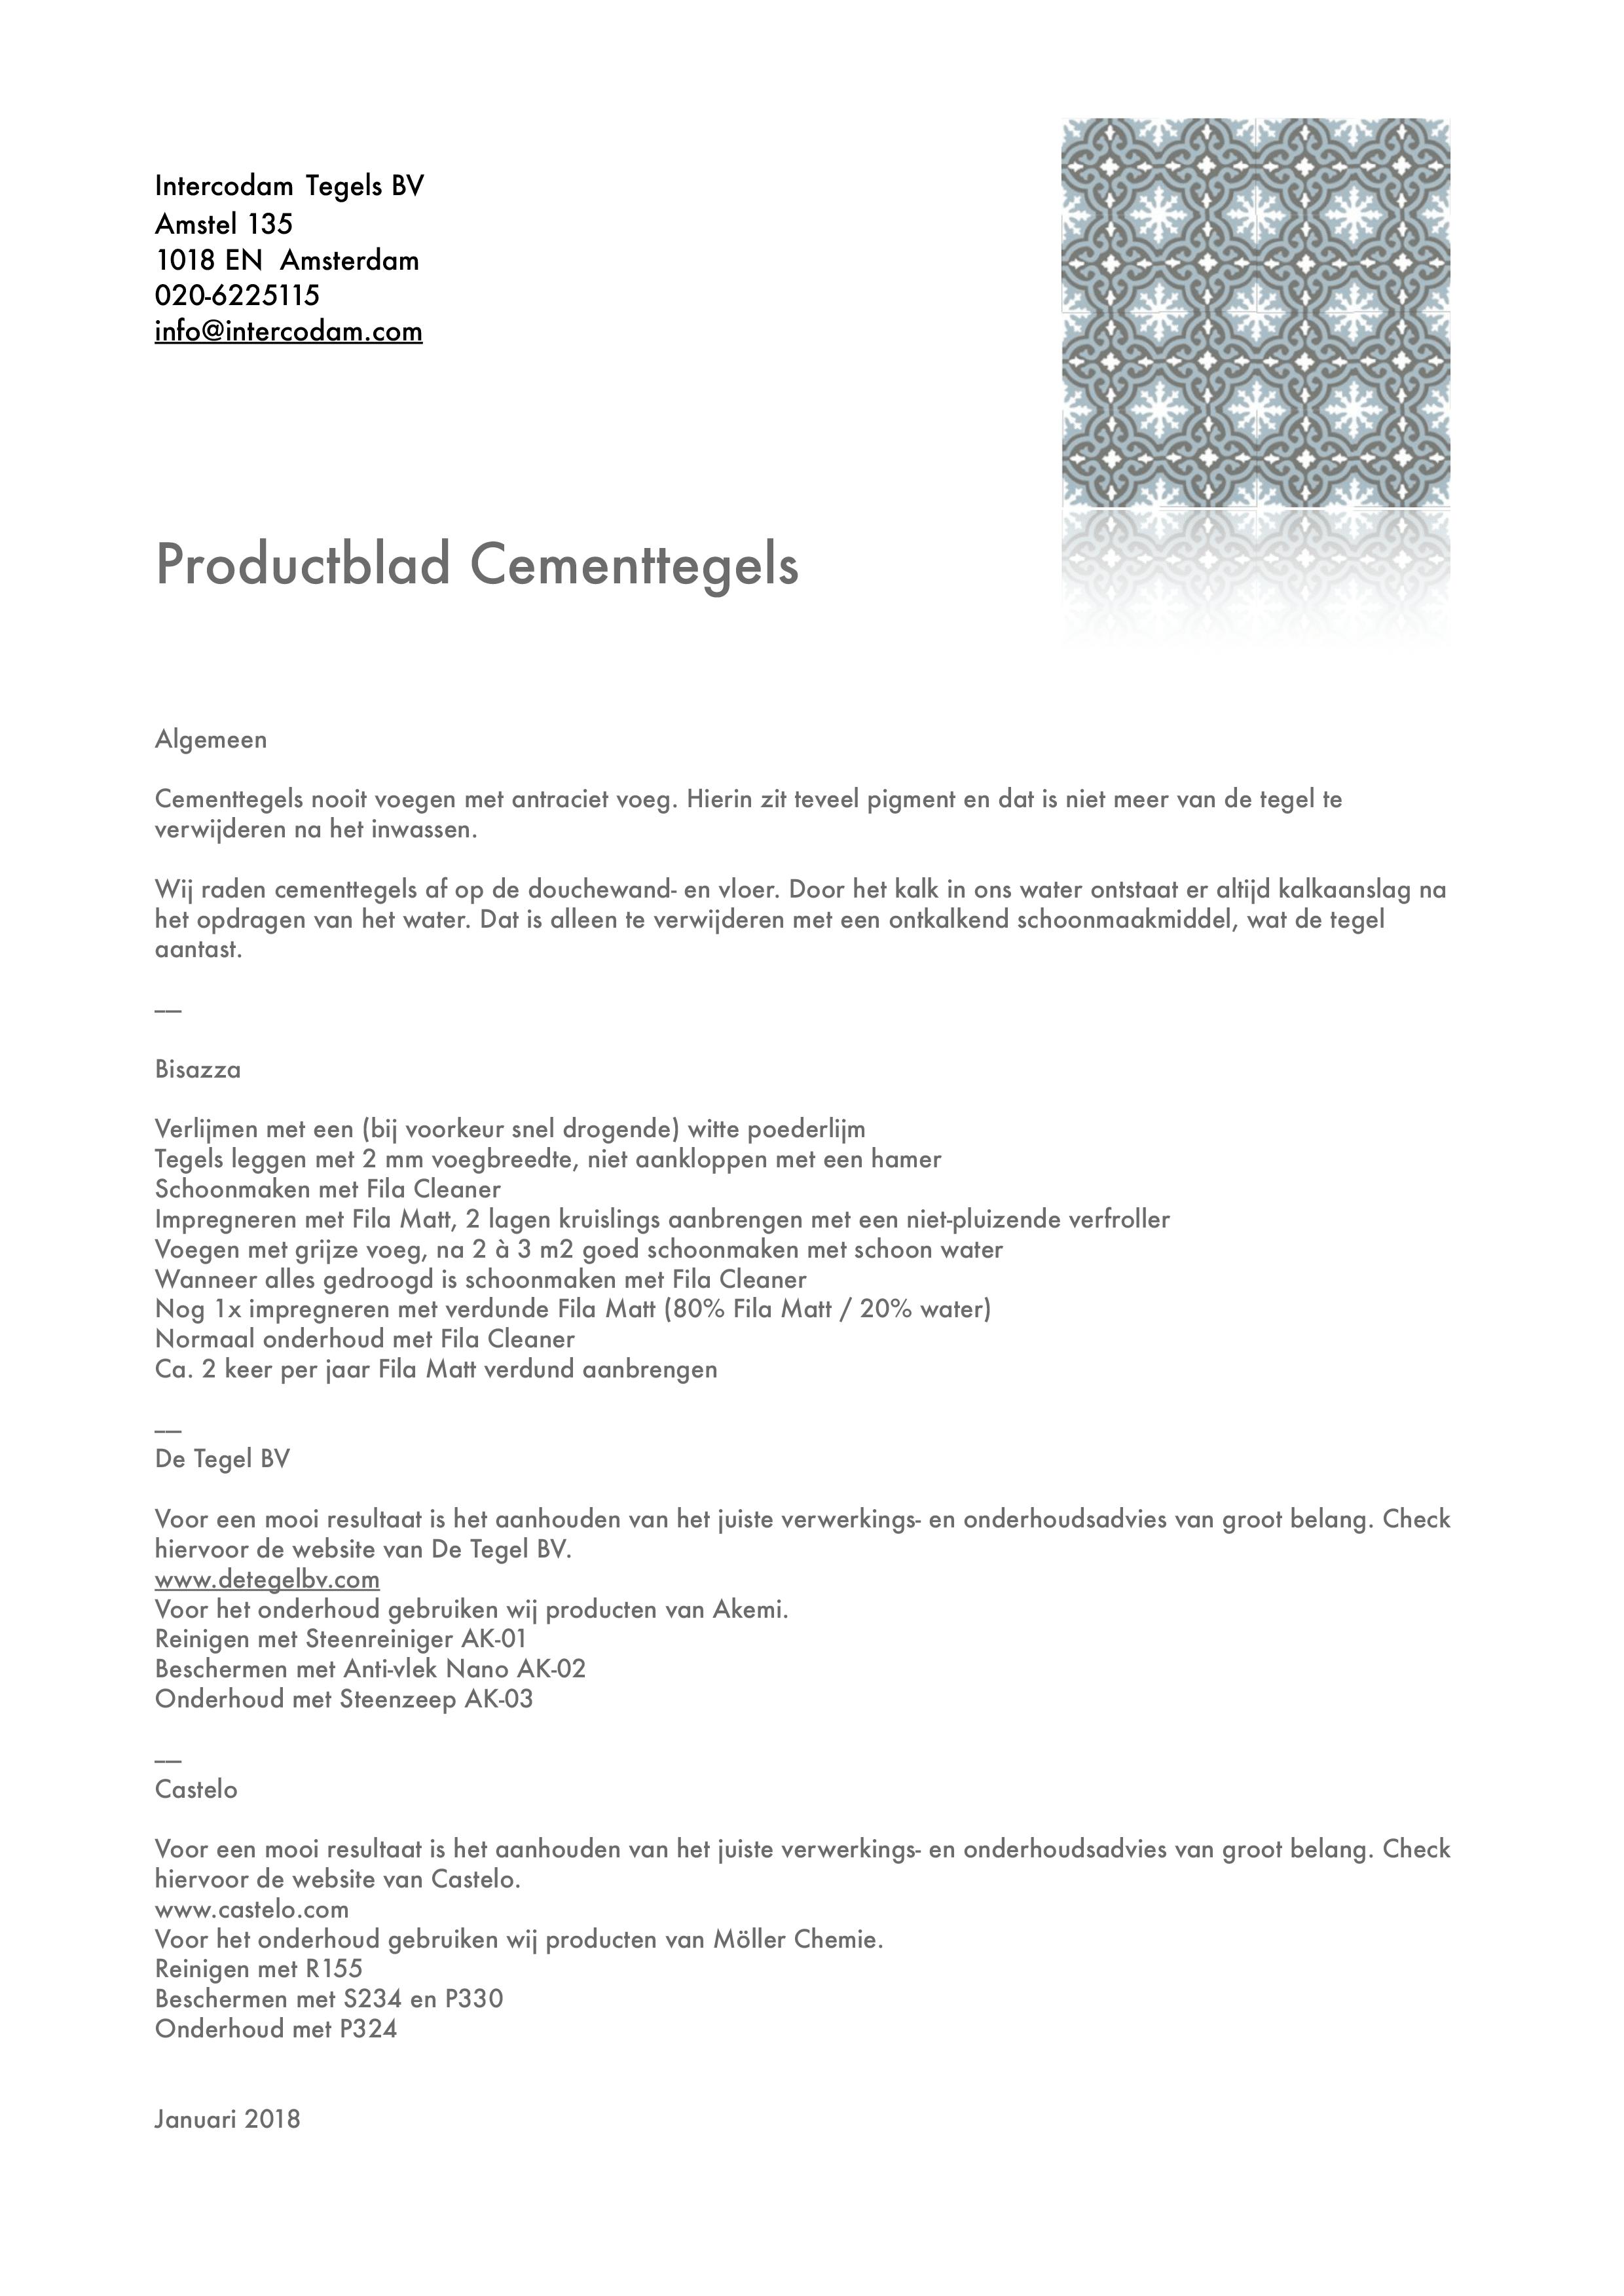 Productblad Cementtegels